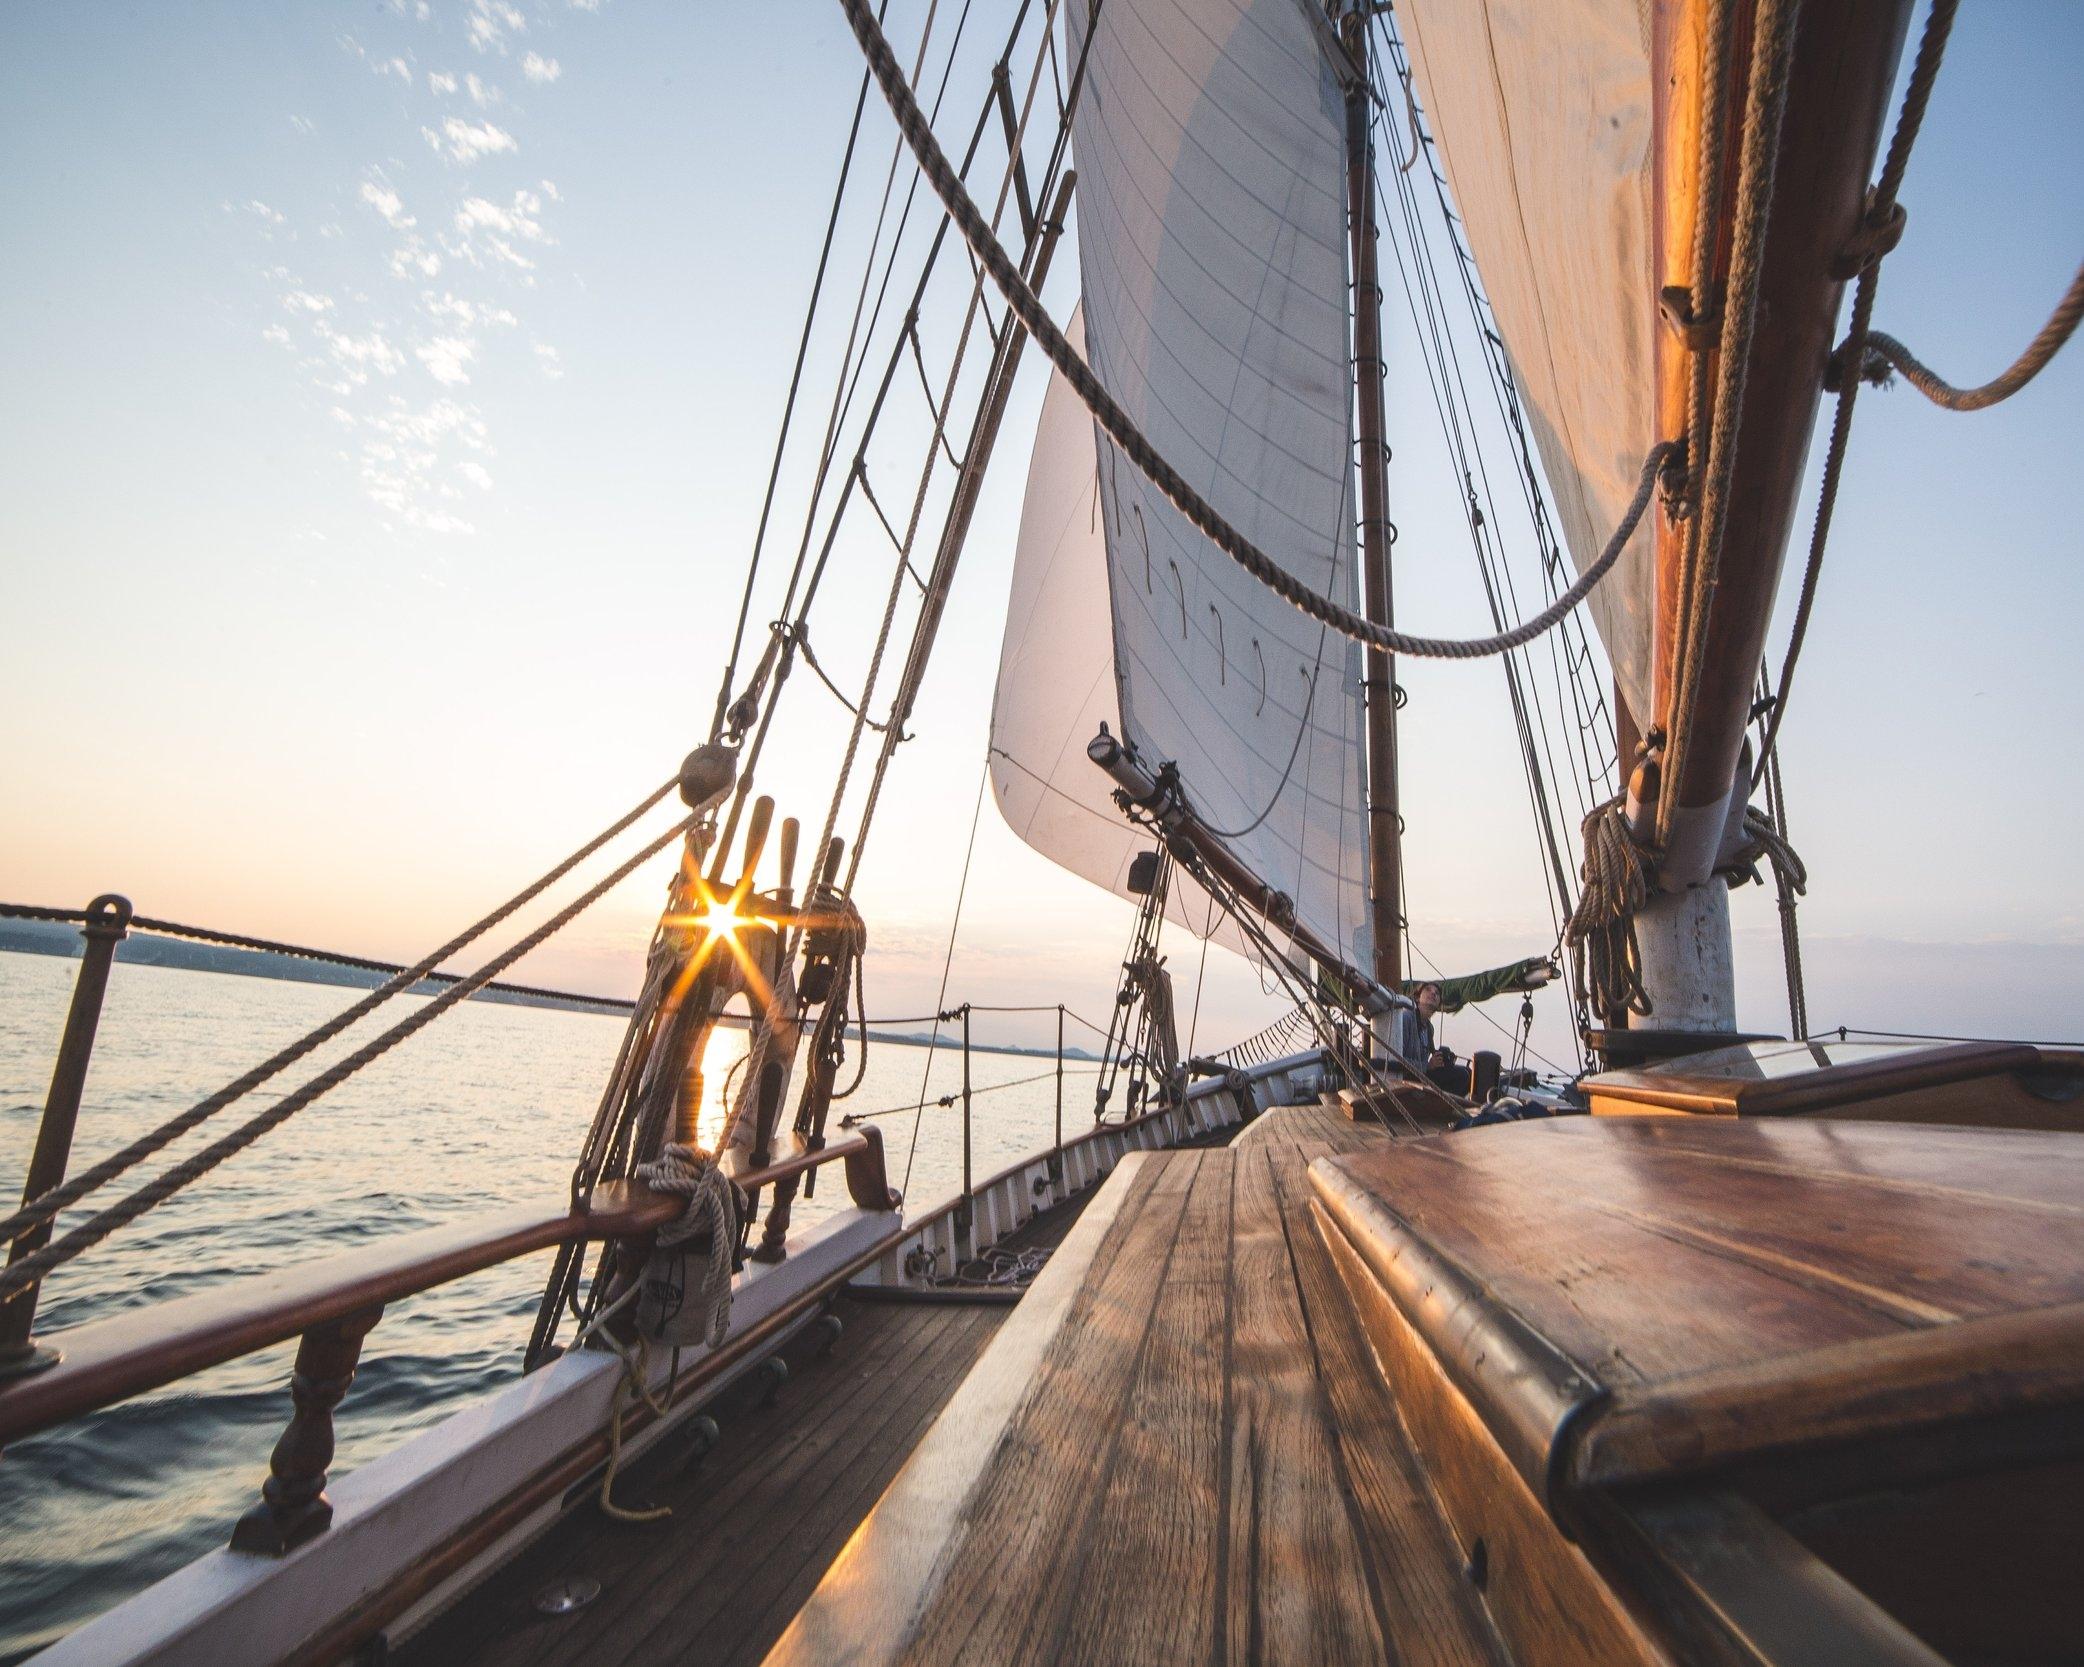 SailingDiving & Hiking -